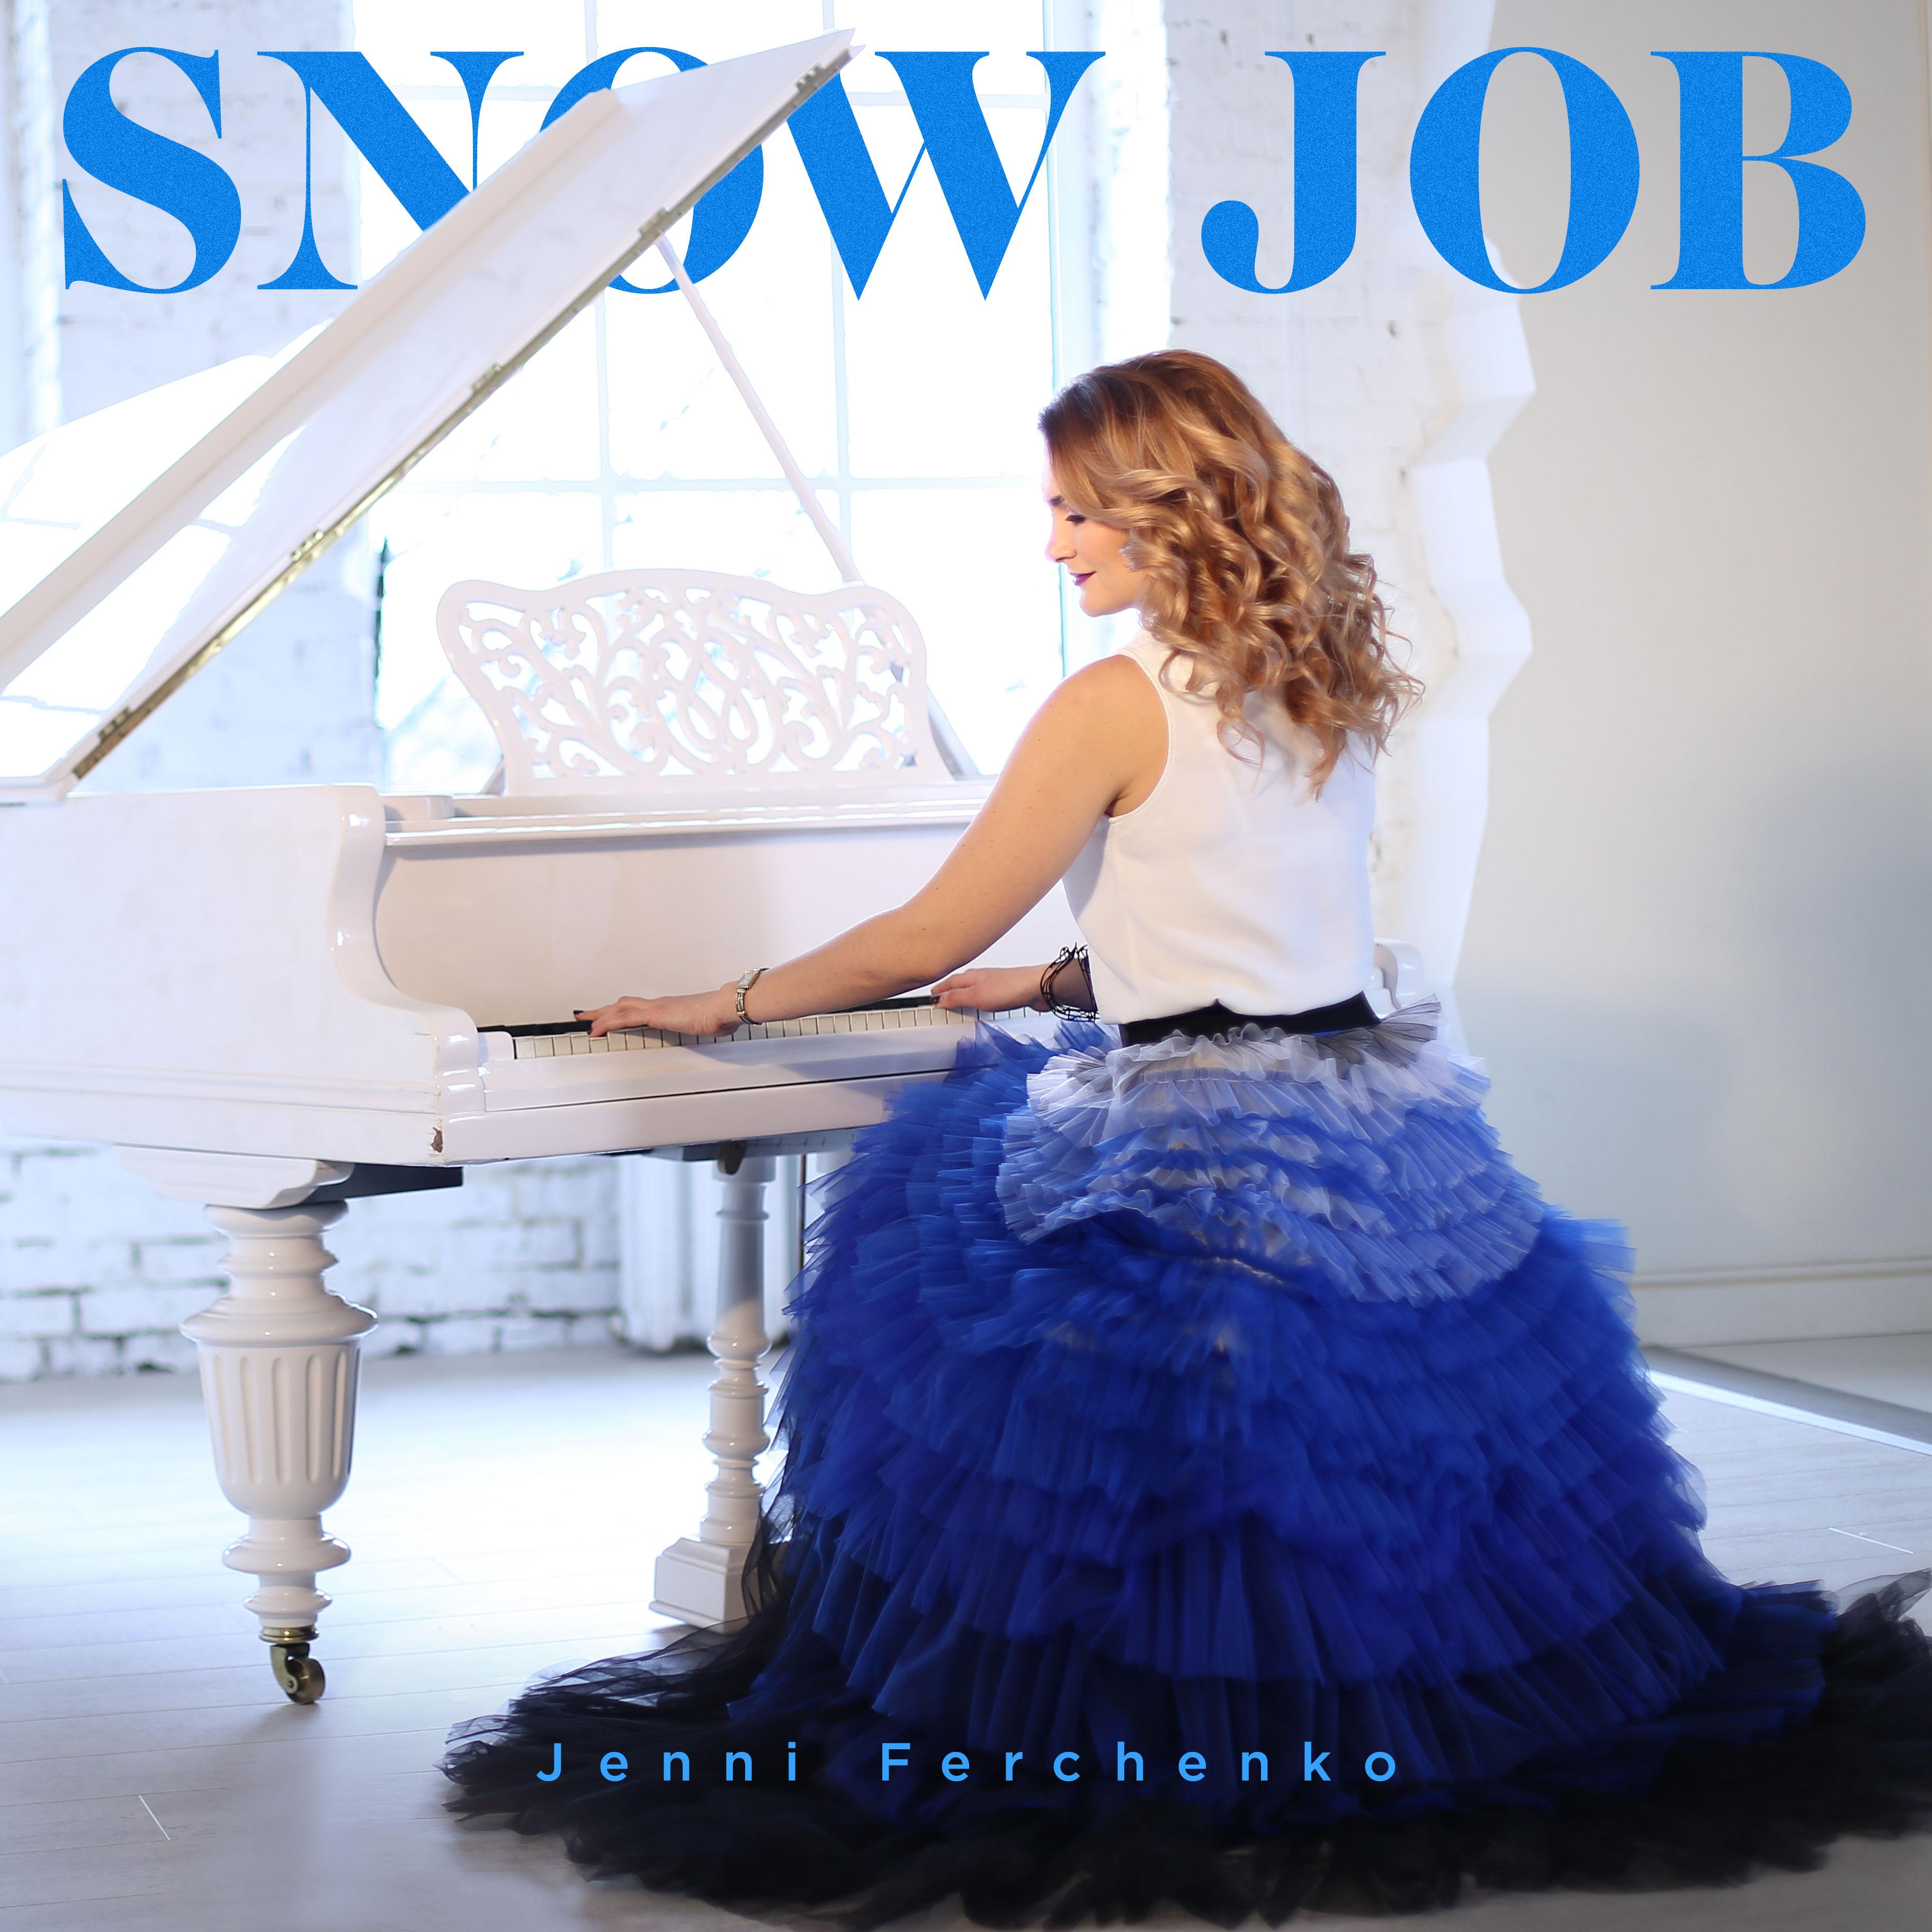 The Snow Job